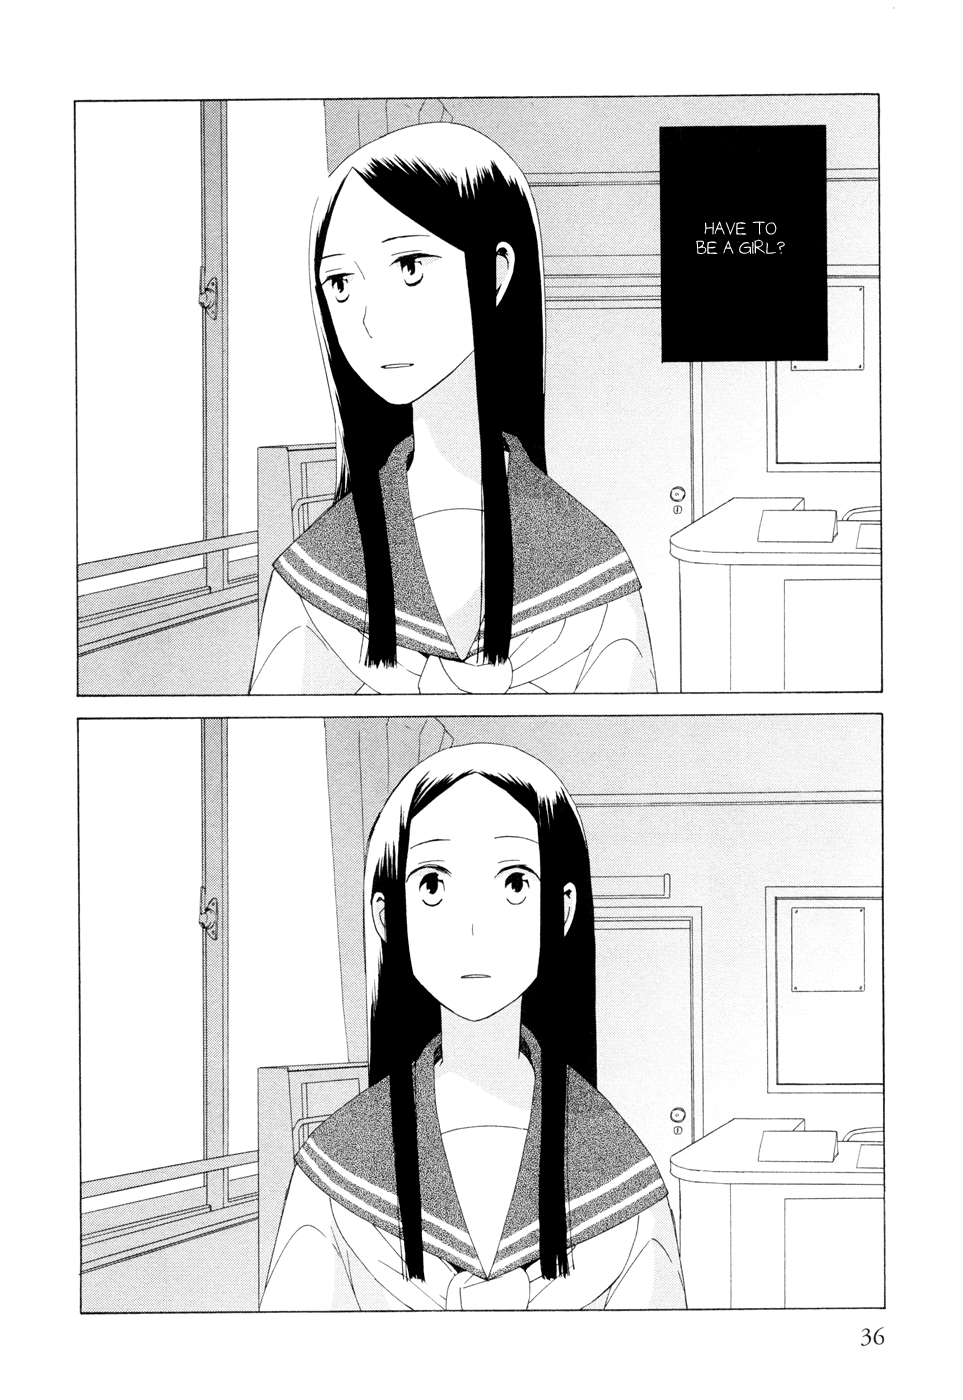 14-sai no Koi - Read Online - 2